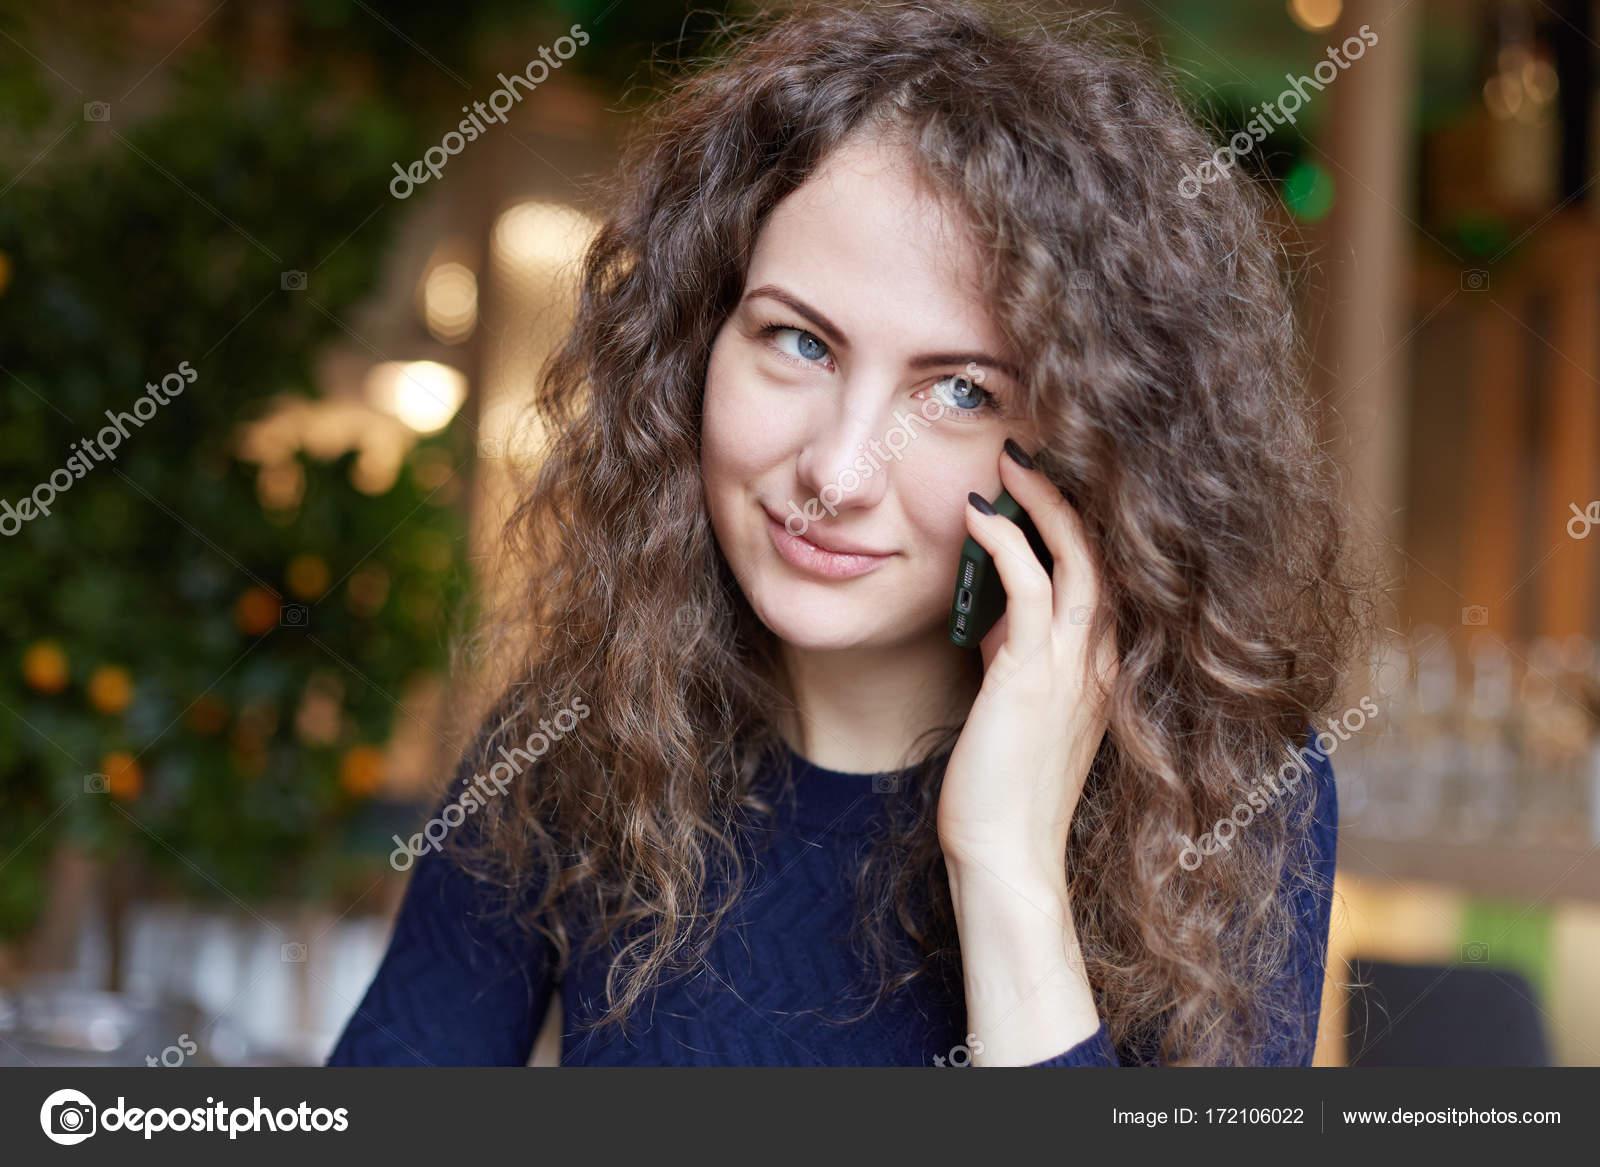 American lesbian dating sites